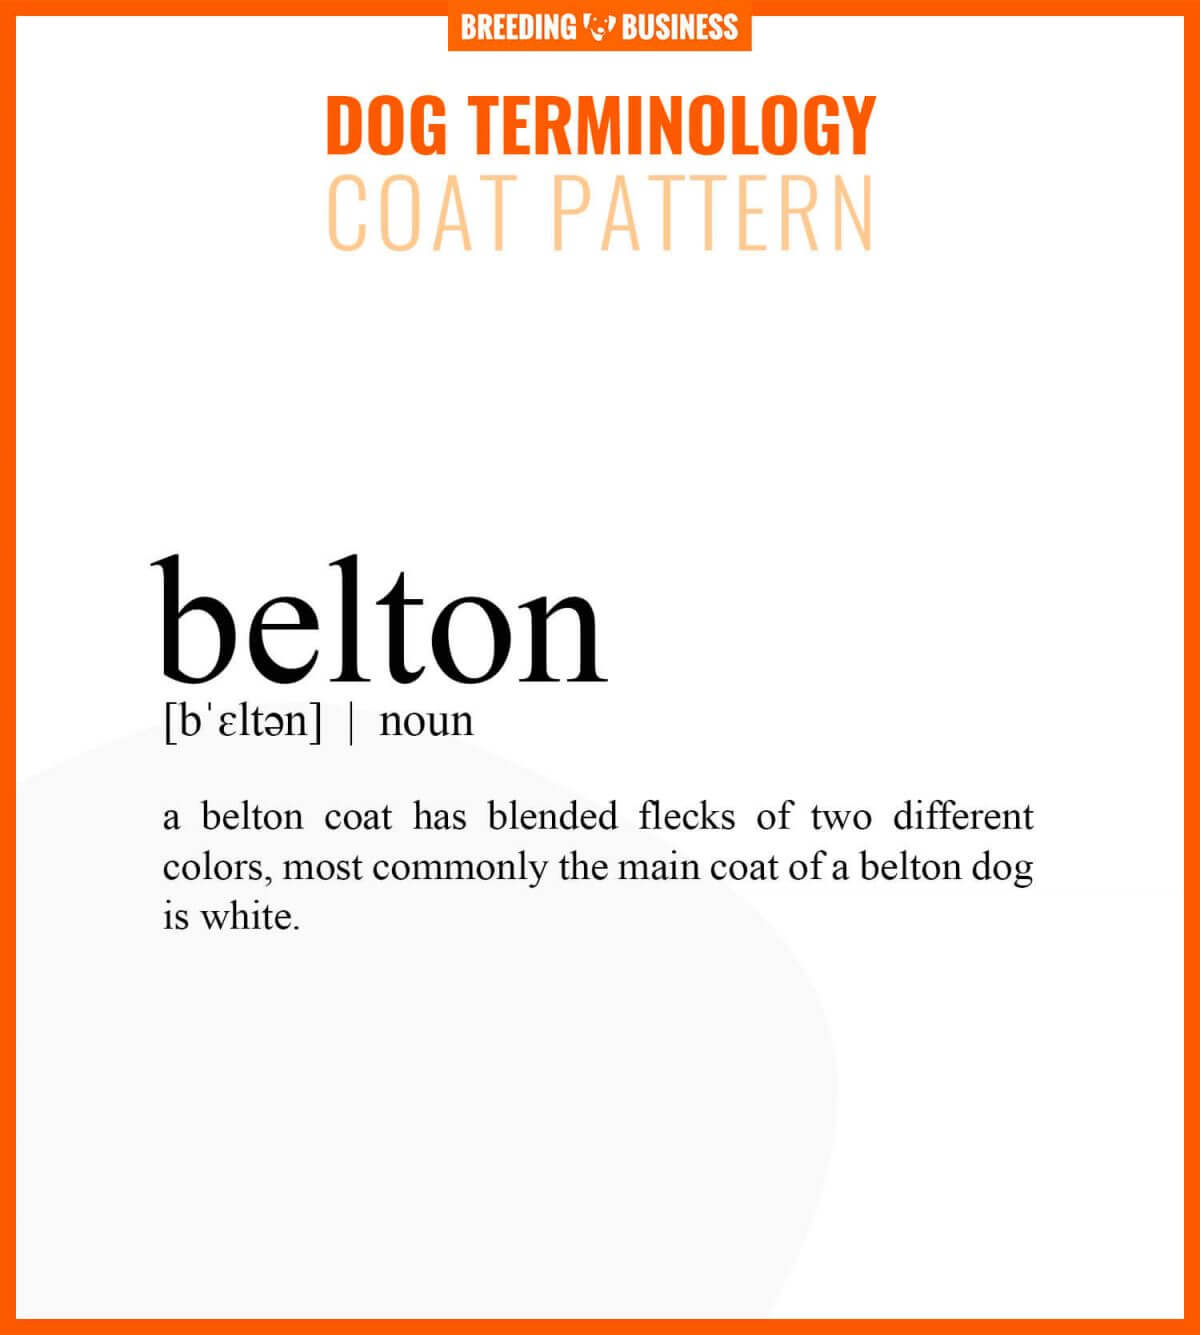 belton dog coat pattern